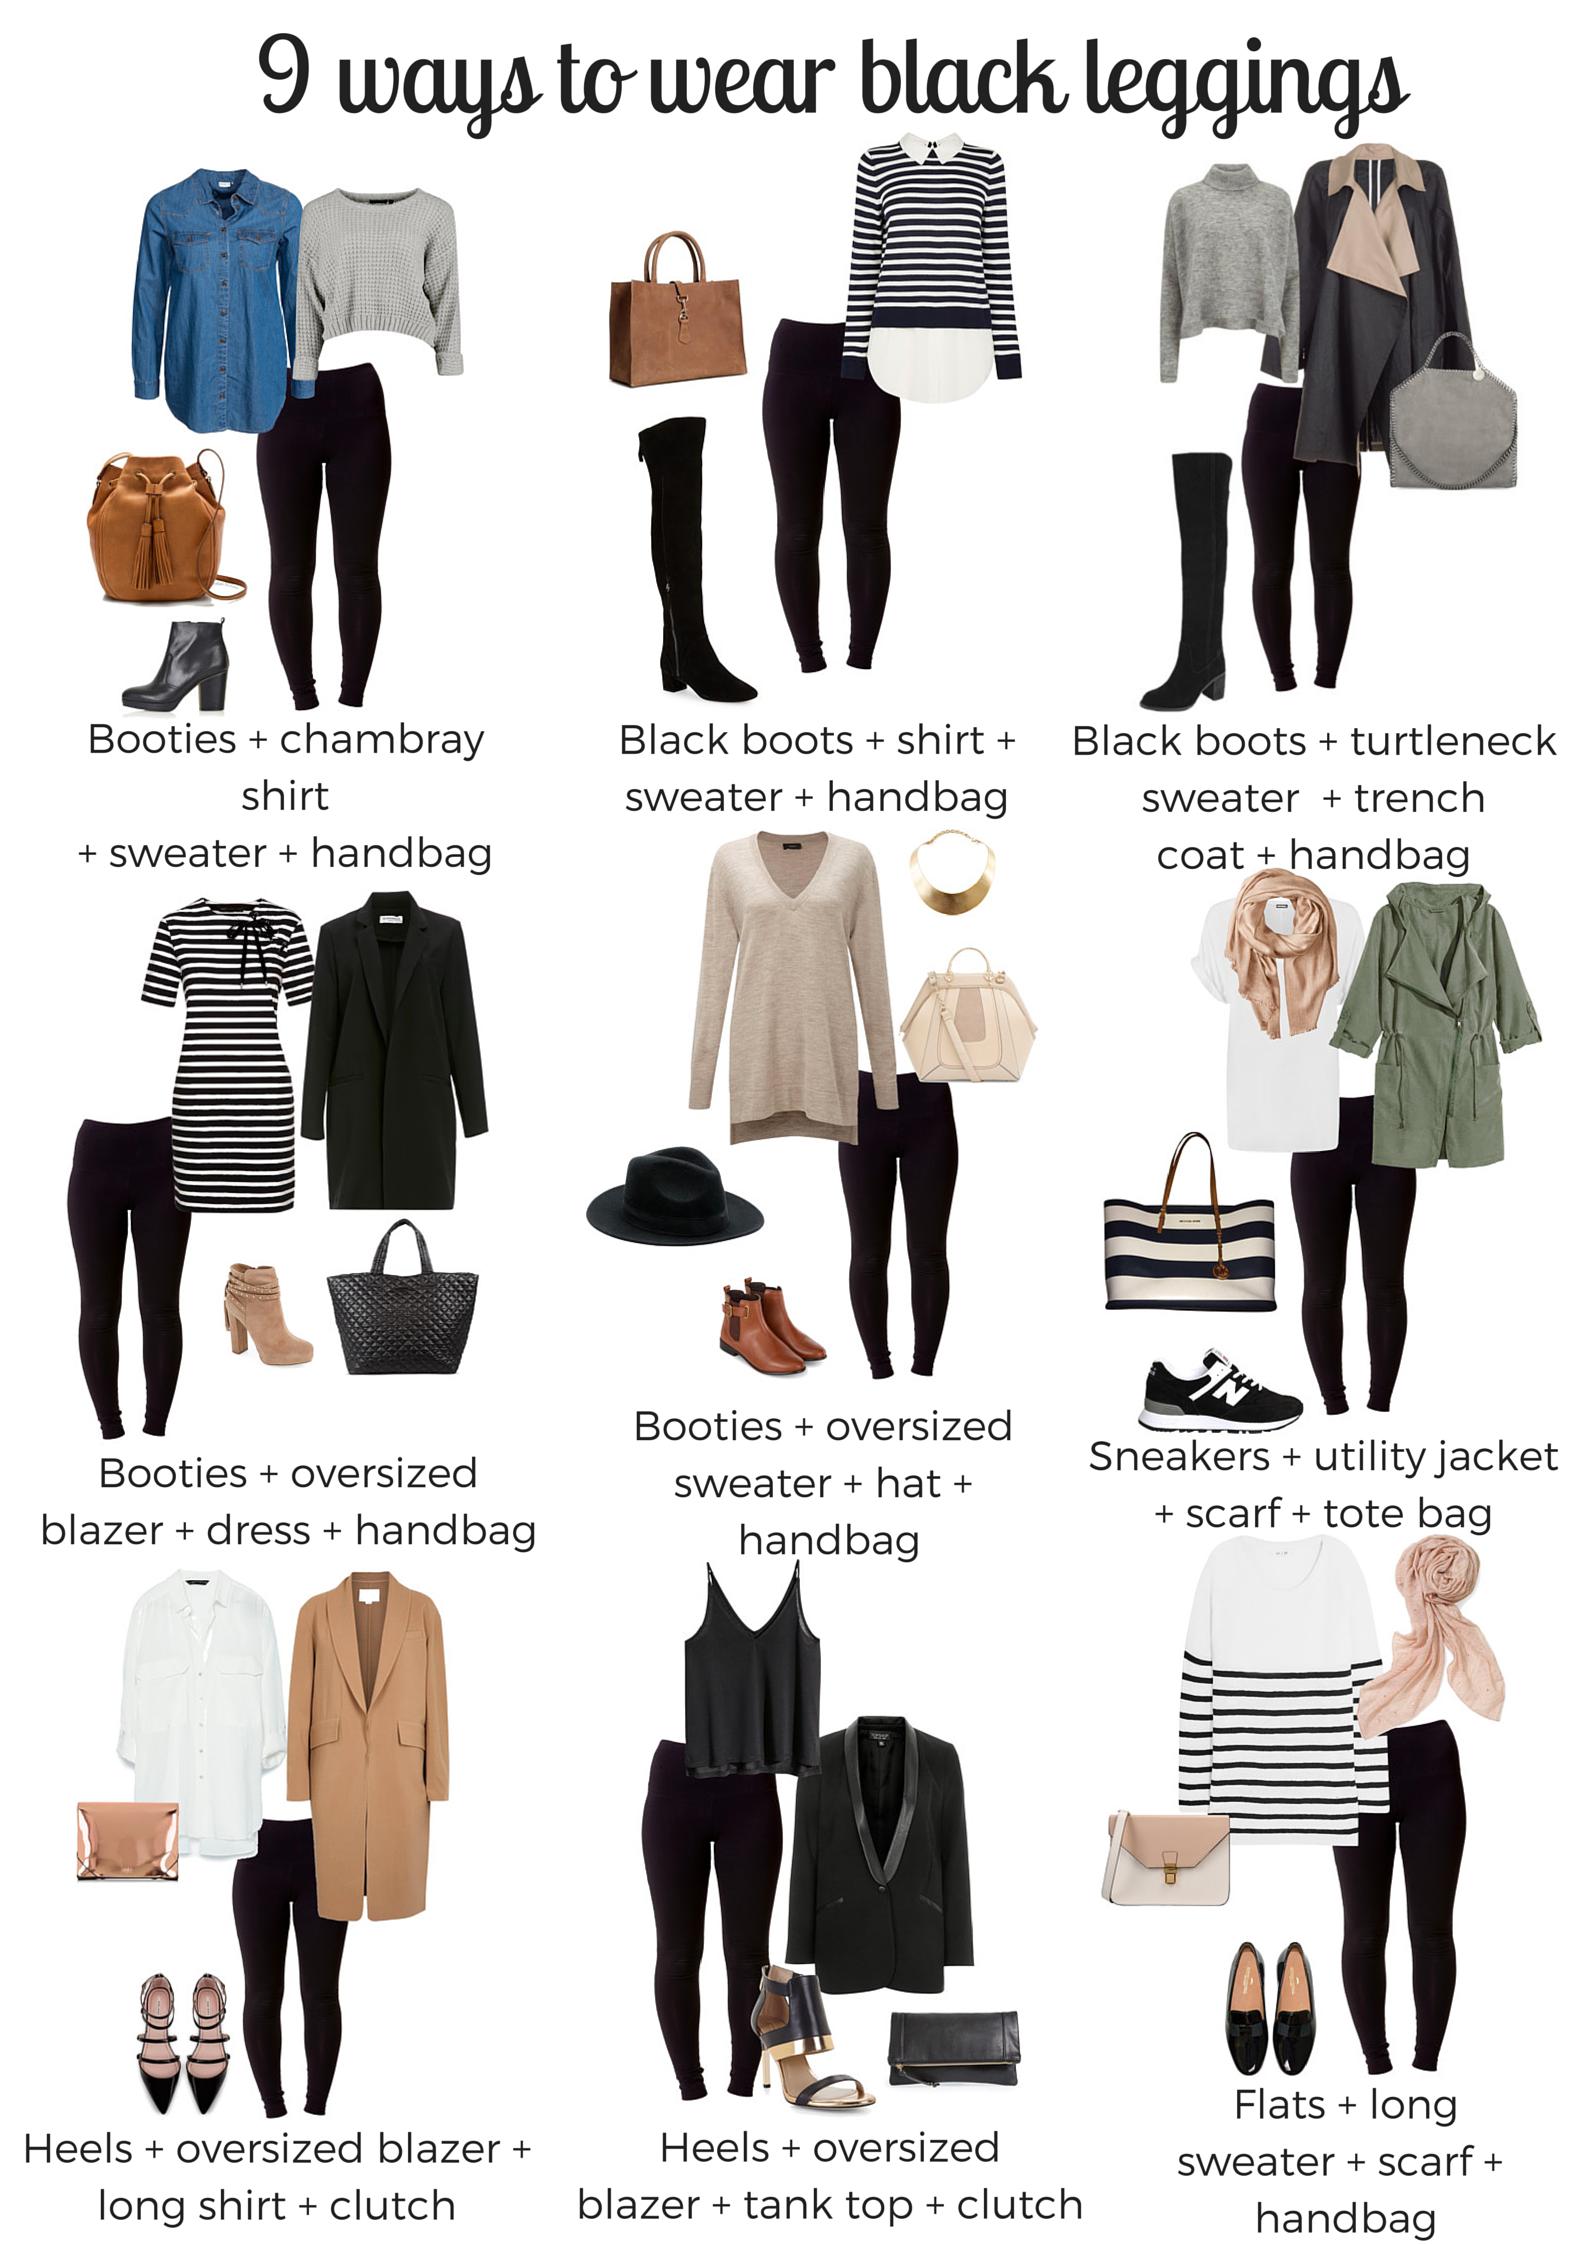 9 ways to wear your shapewear leggings 9 ways to wear your shapewear leggings